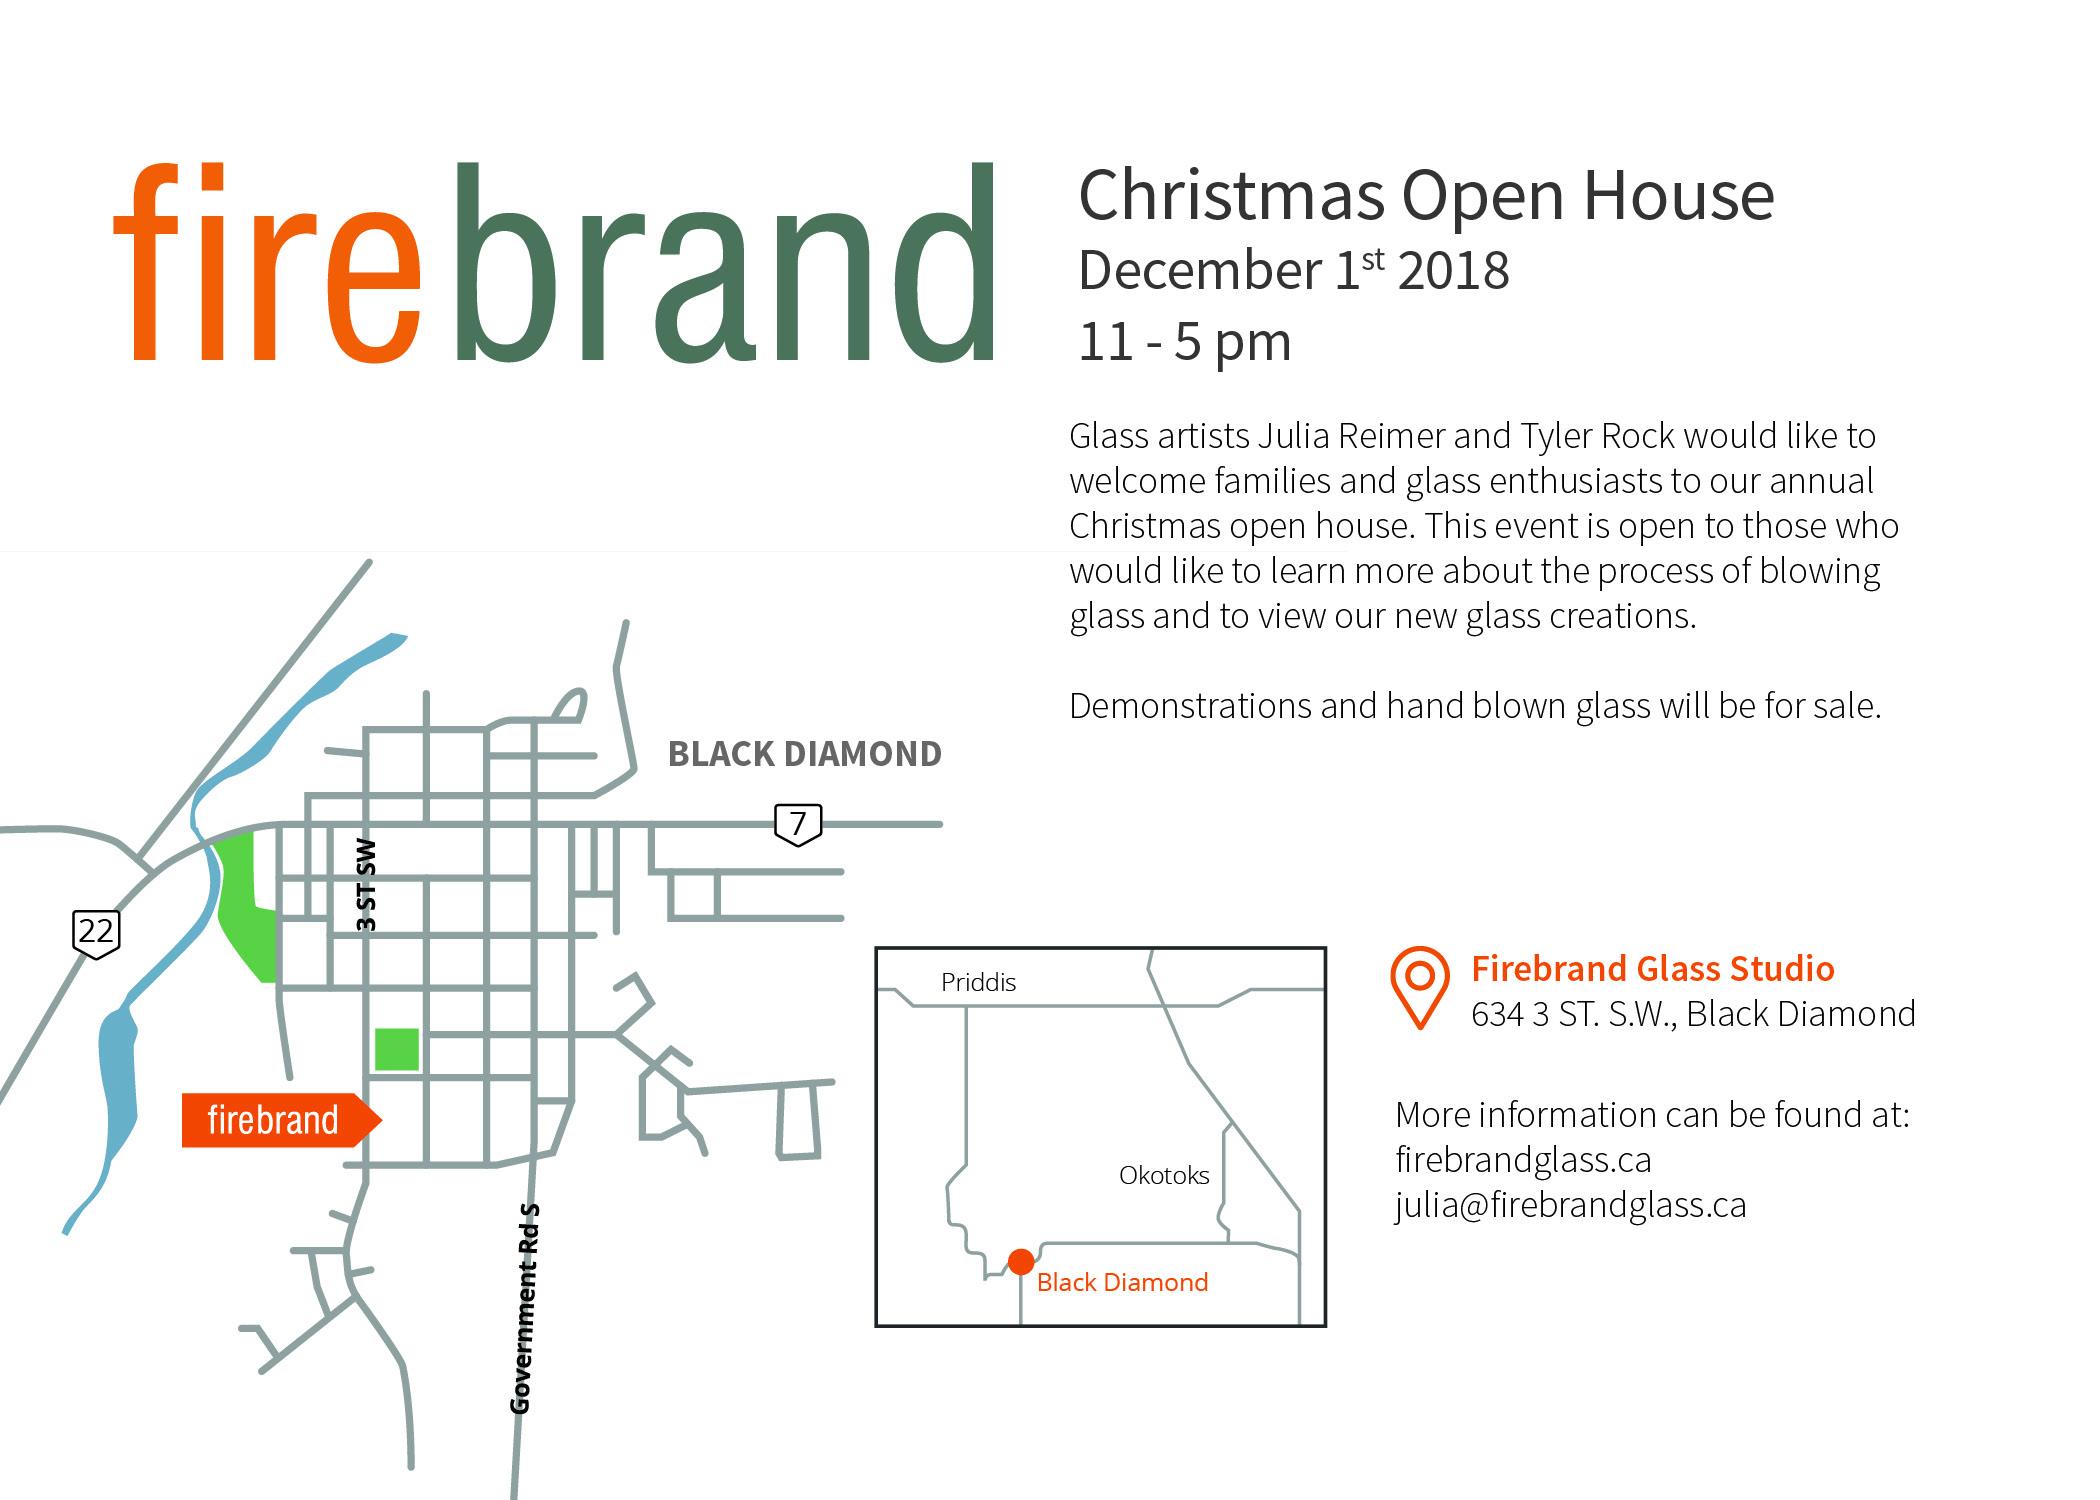 FB001 Christmas Open House Postcard_2018_Digital1.jpg